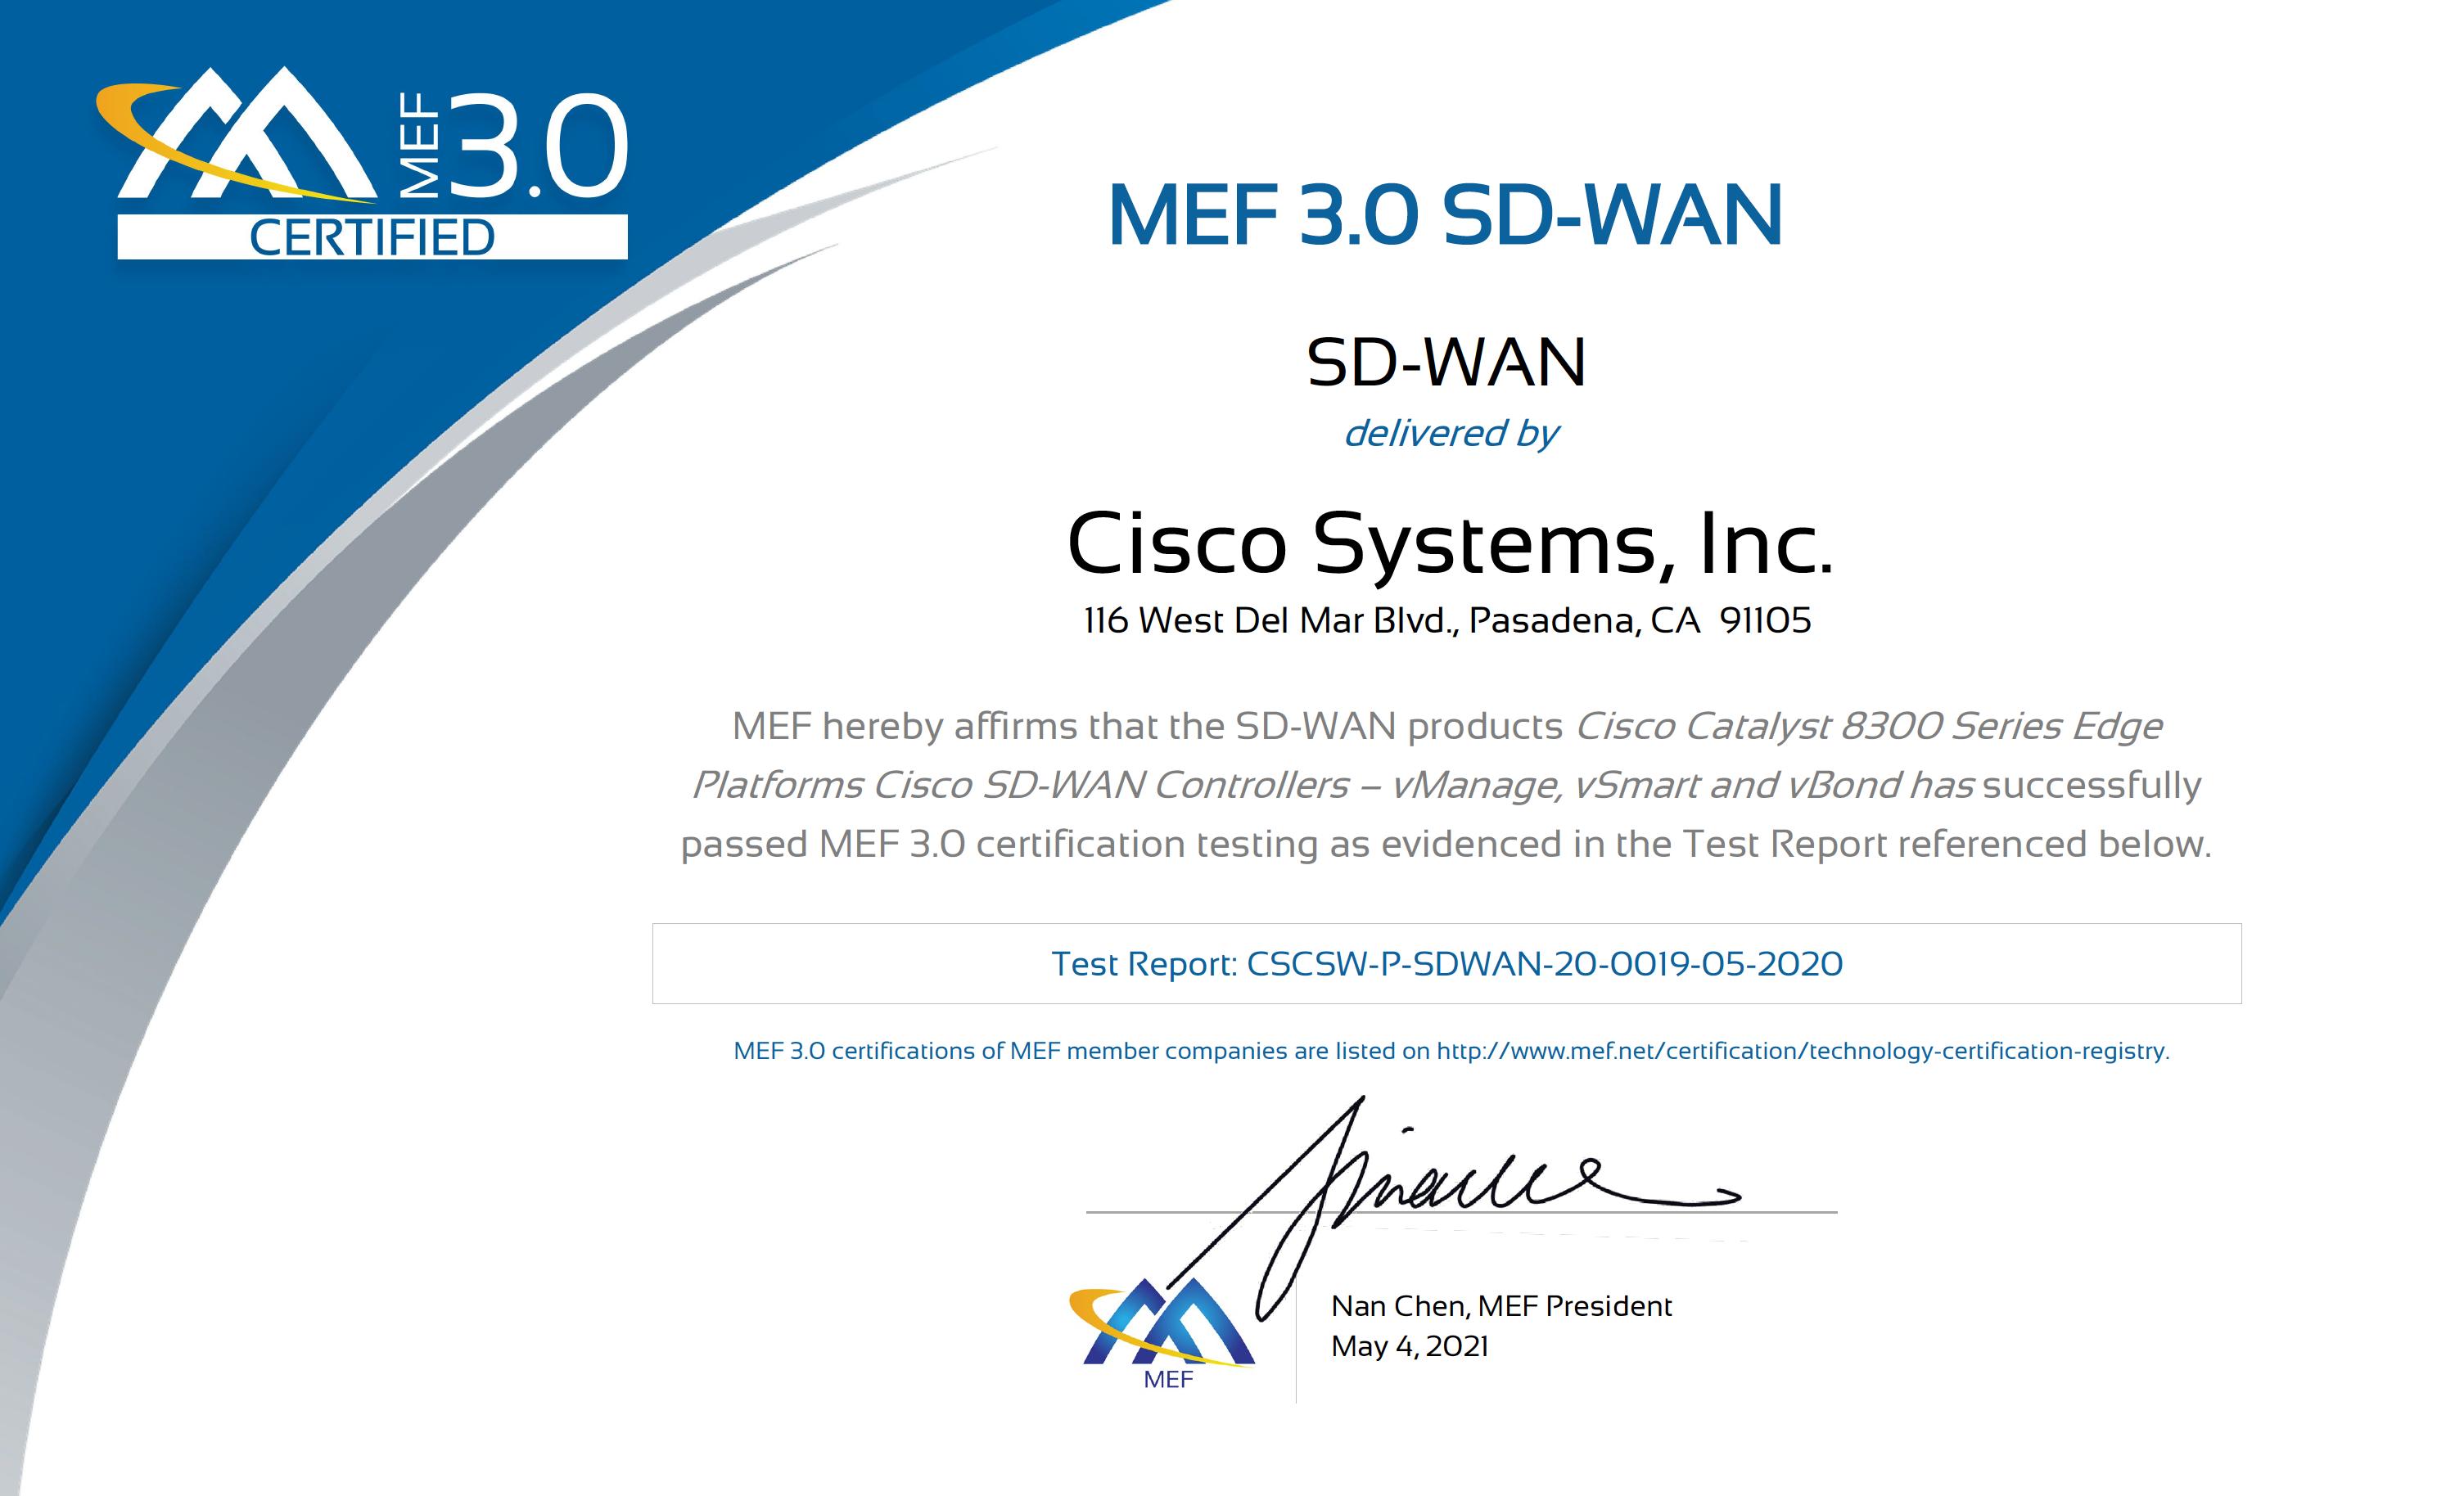 MEF 3.0 SD-WAN Certificate - Cisco Certification